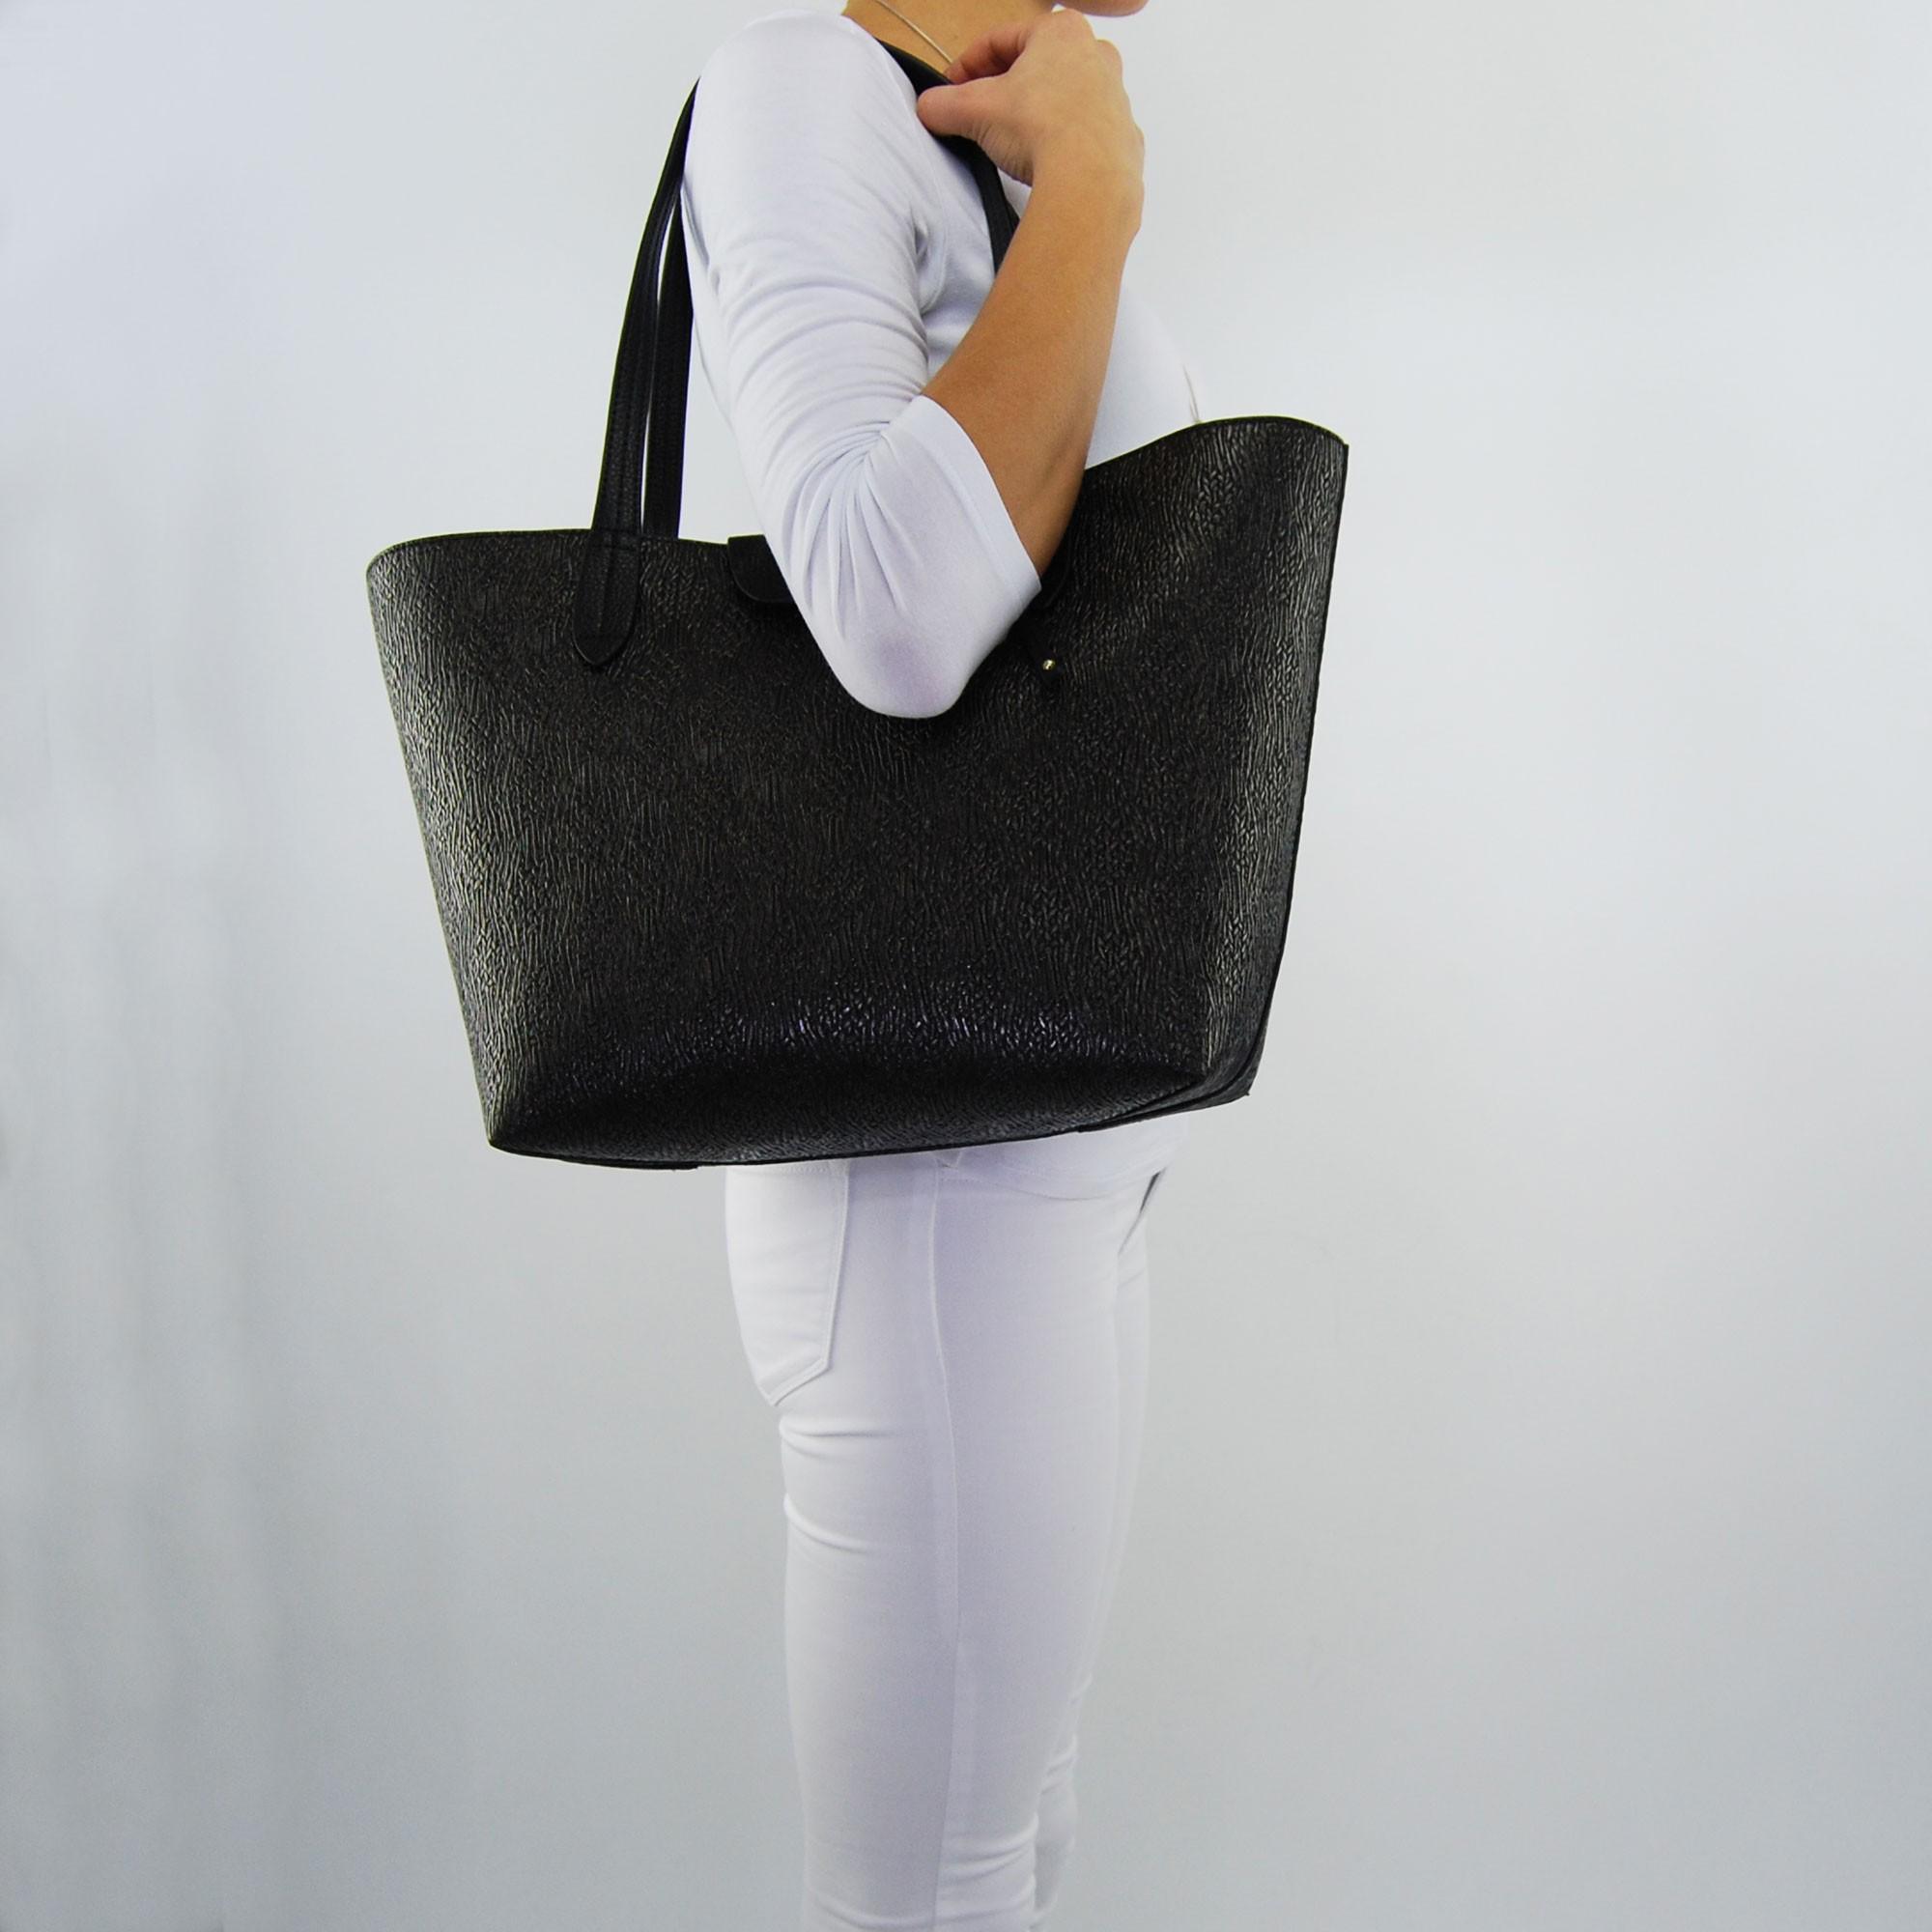 e06ca5125c Shopping bag by Patrizia Pepe black reversible black laminated